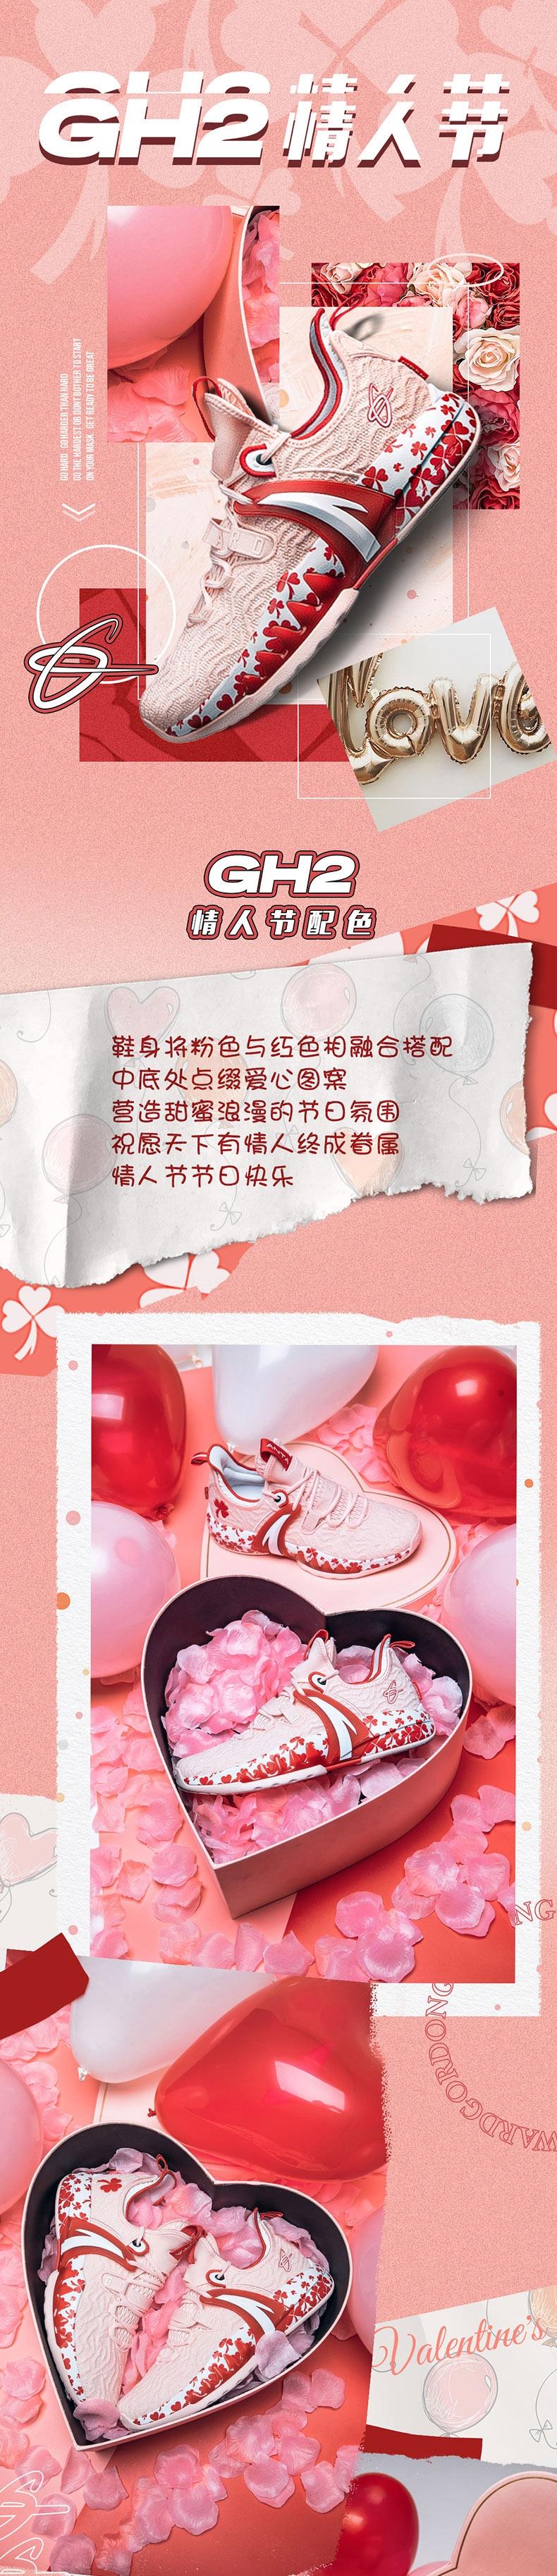 "Anta GH2 ""Valentine's Day"" Gordon Hayward 2021 Low Basketball Sneakers"